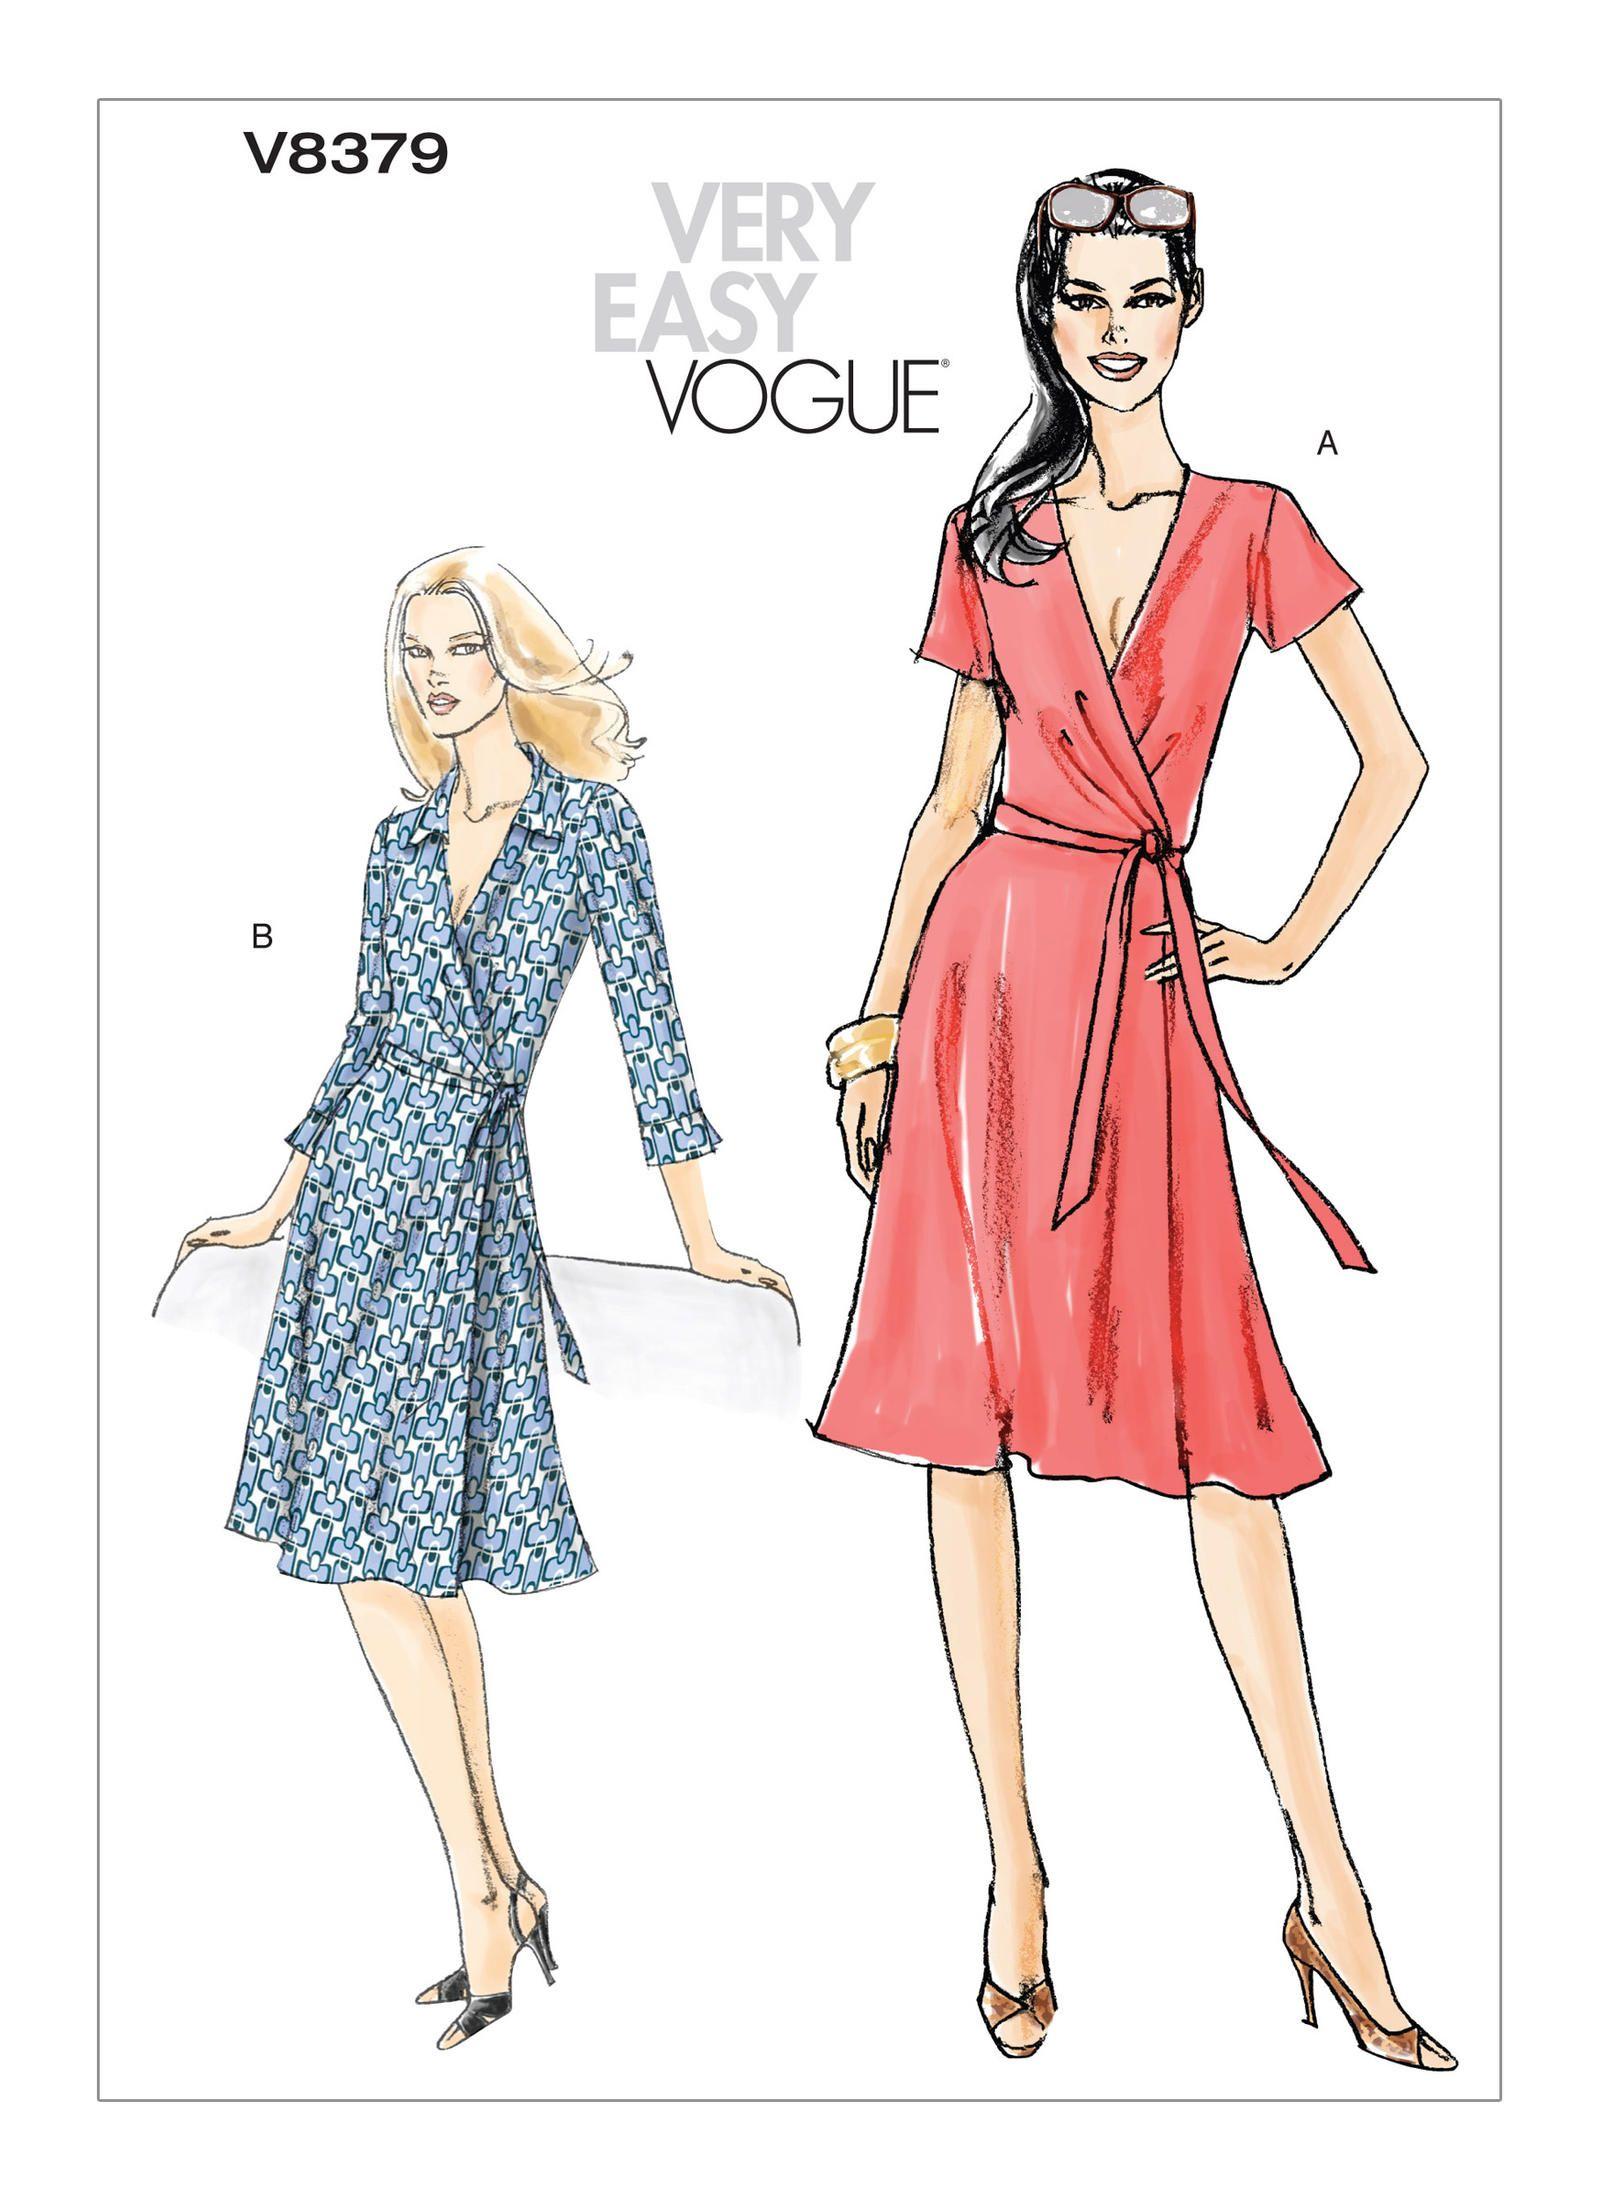 V8379 Vogue Patterns Wrap Dress Sewing Patterns Wrap Dress Pattern Vogue Patterns [ 2200 x 1600 Pixel ]